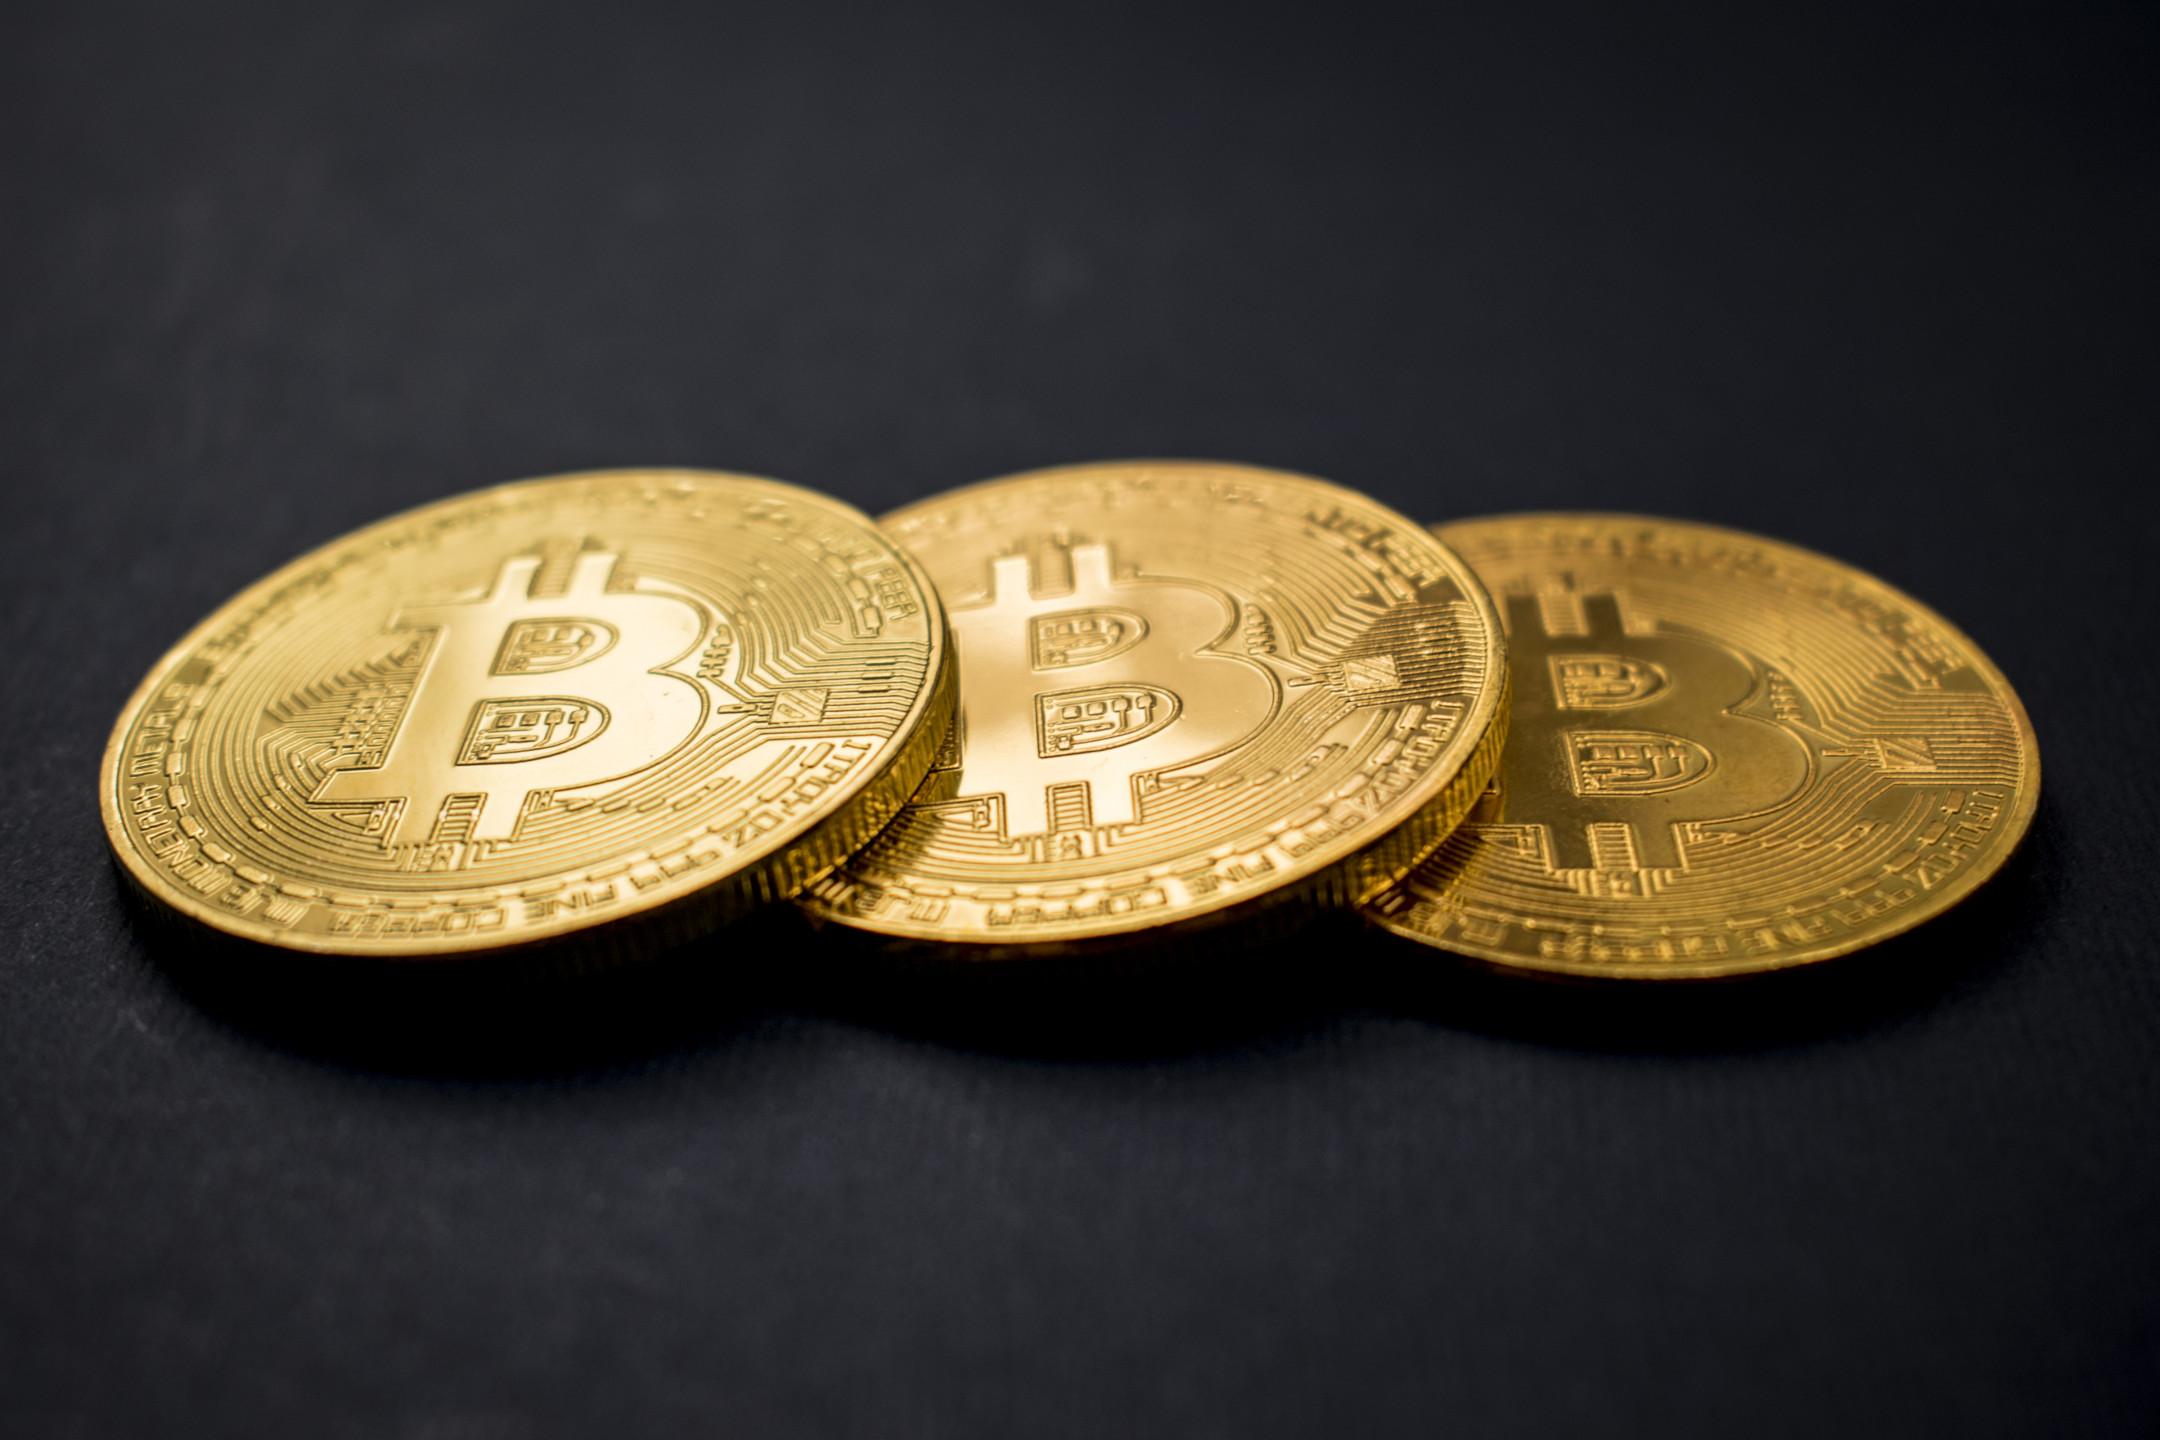 Bitcoin price surges above $7000 - Is BTCUSD next target $8000?